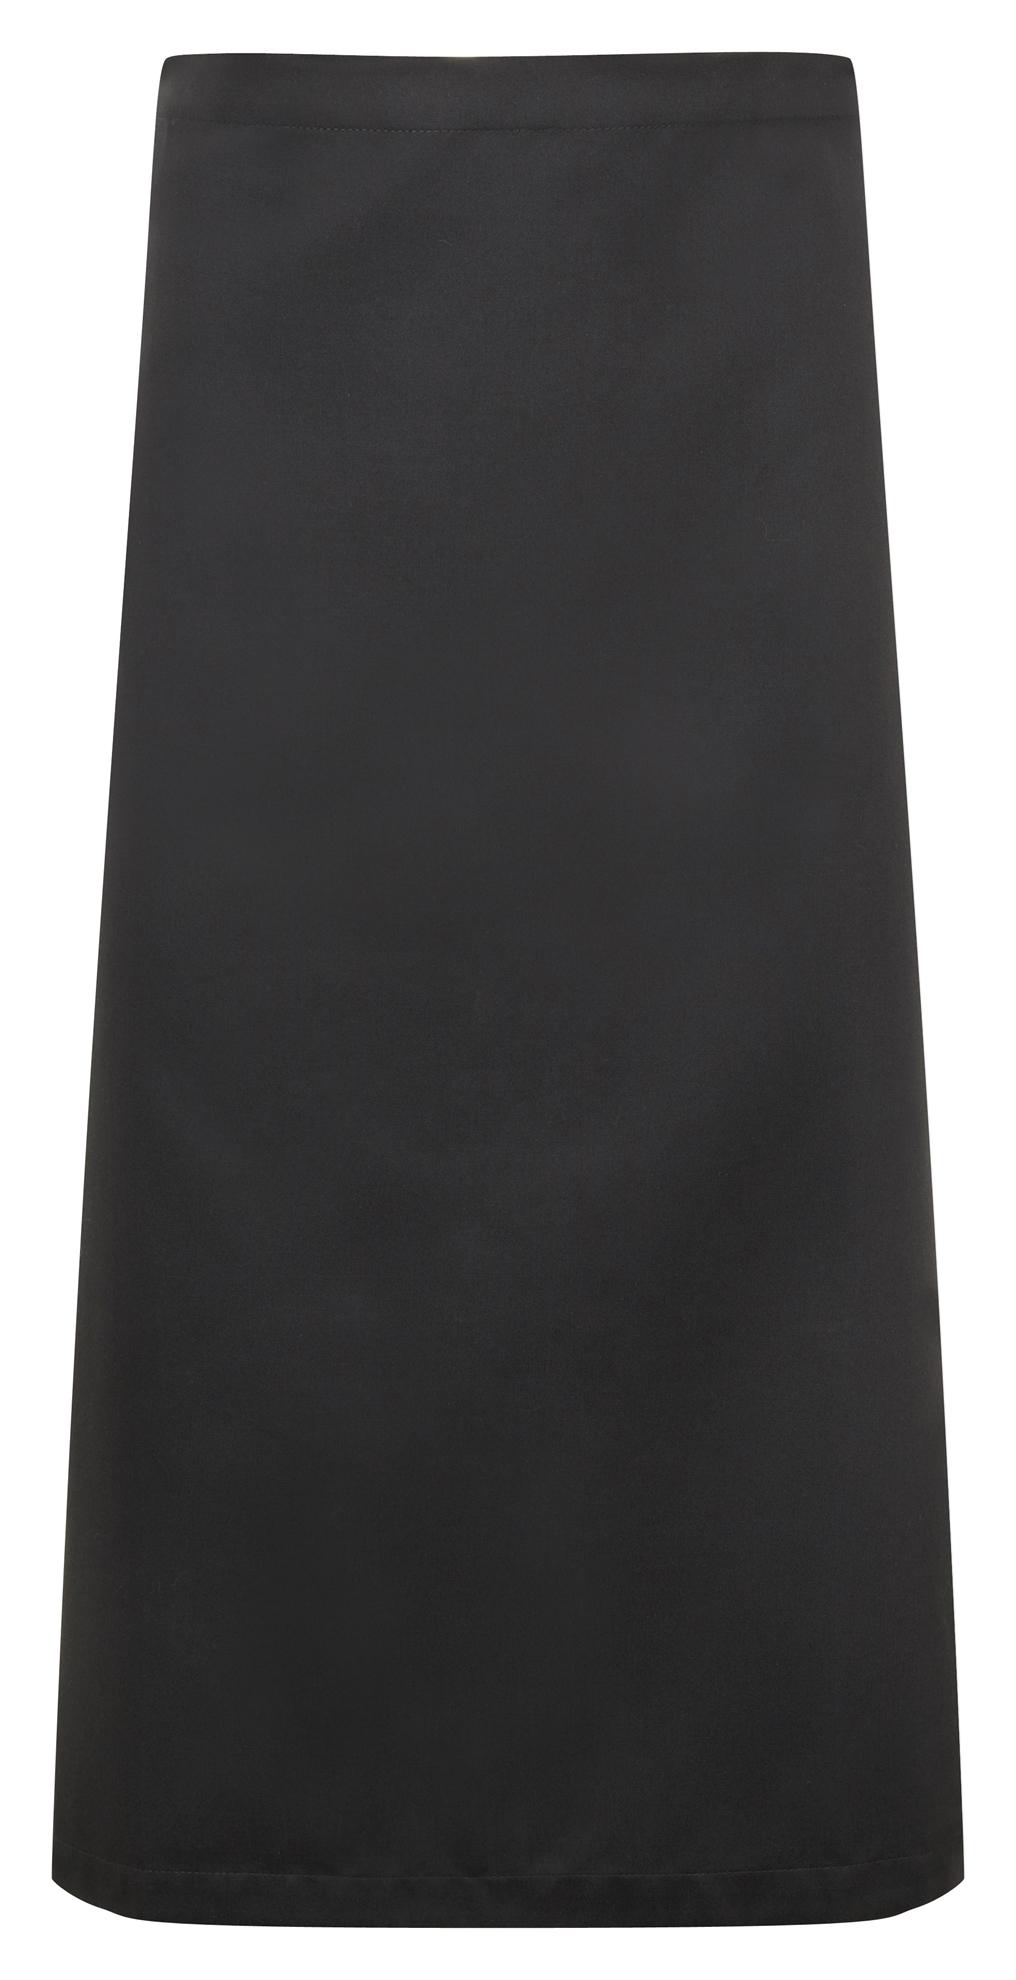 Picture of Chefs long waist apron - Black